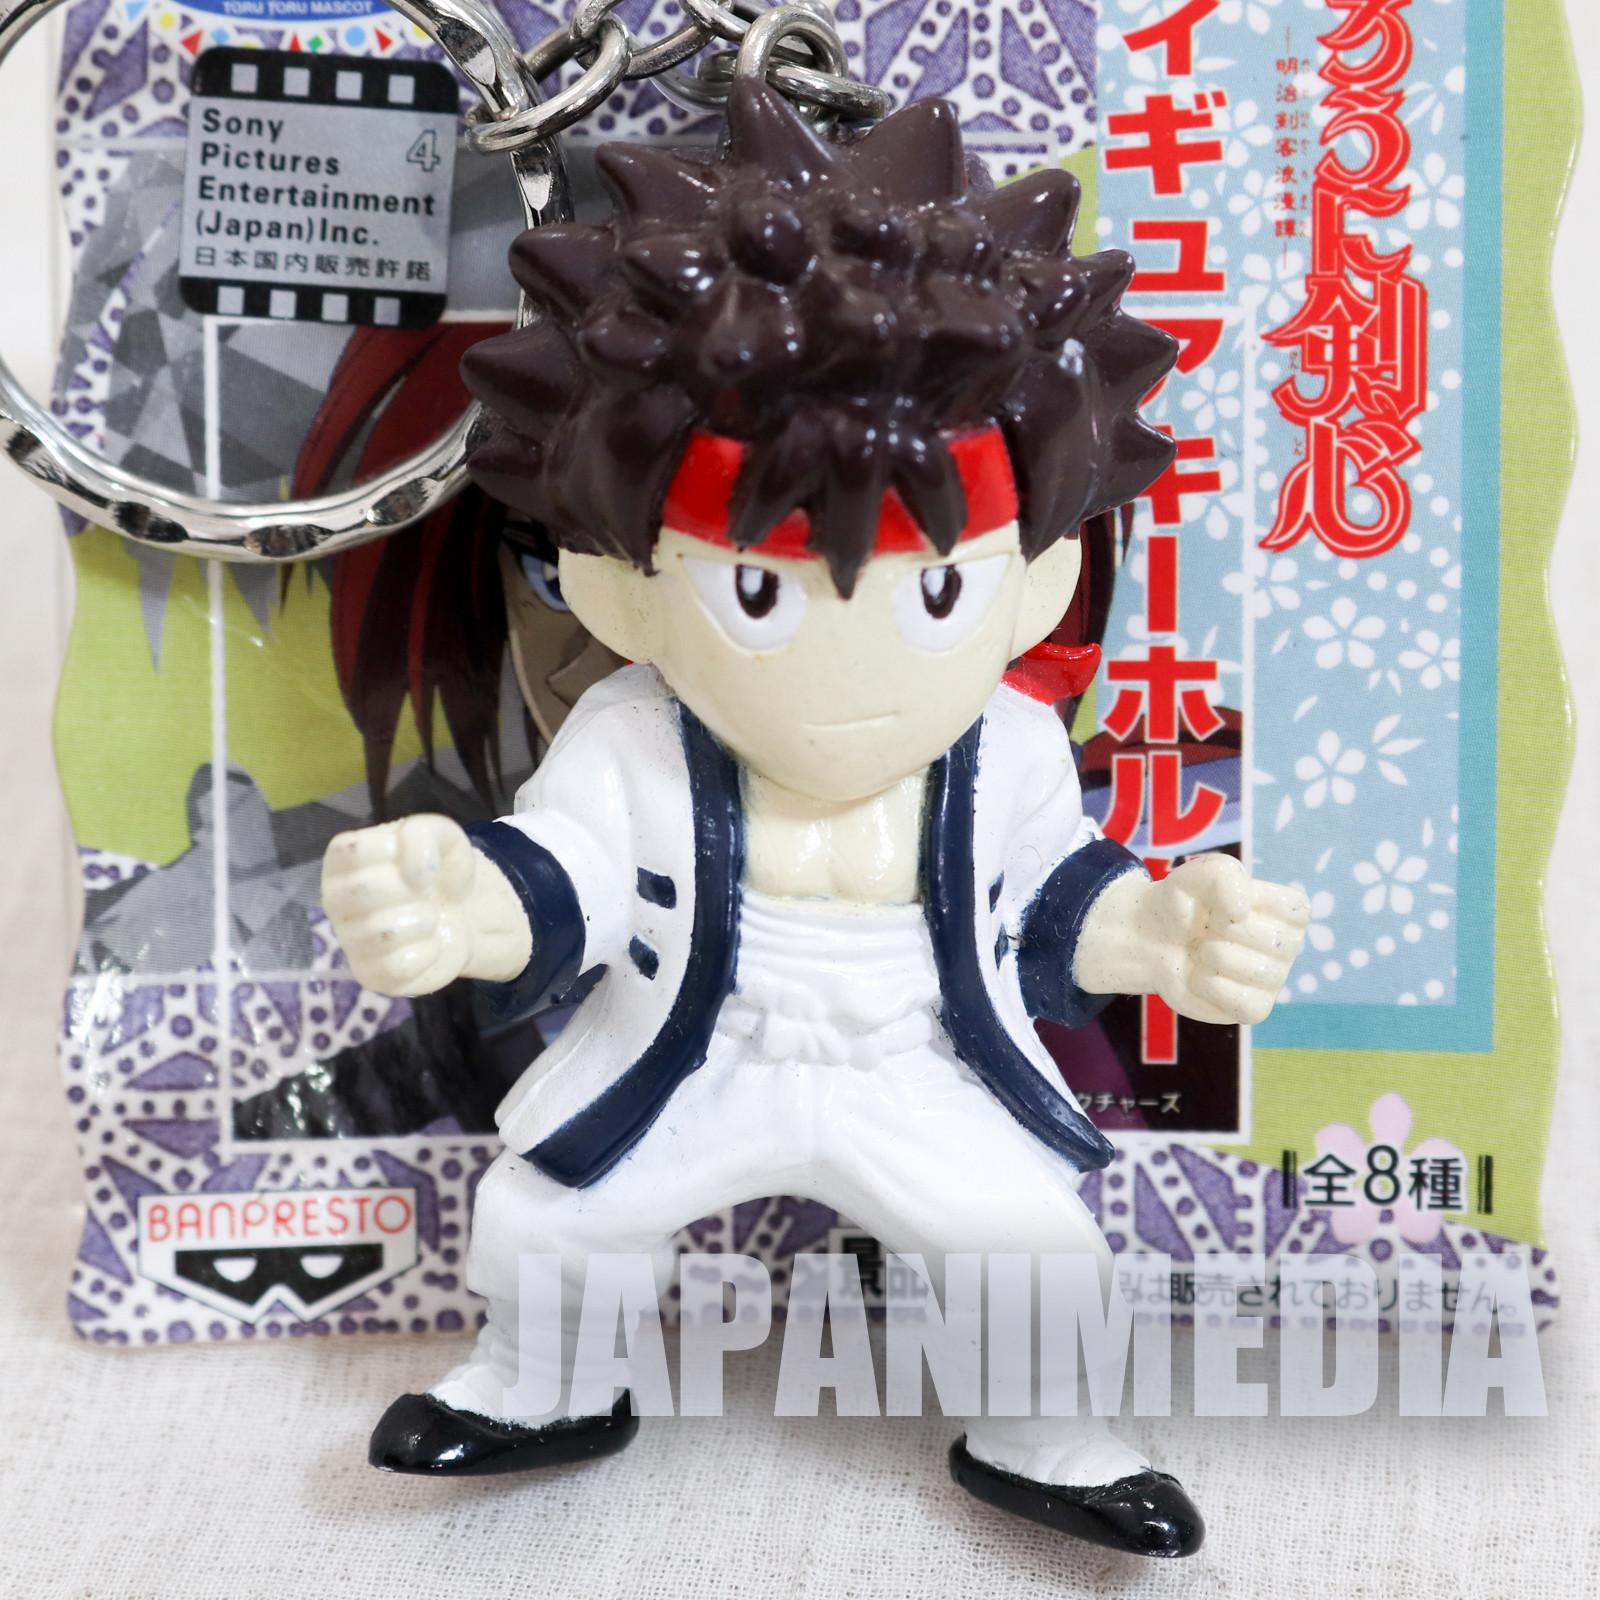 Rurouni Kenshin Sanosuke Sagara Figure Keychain JAPAN ANIME MANGA